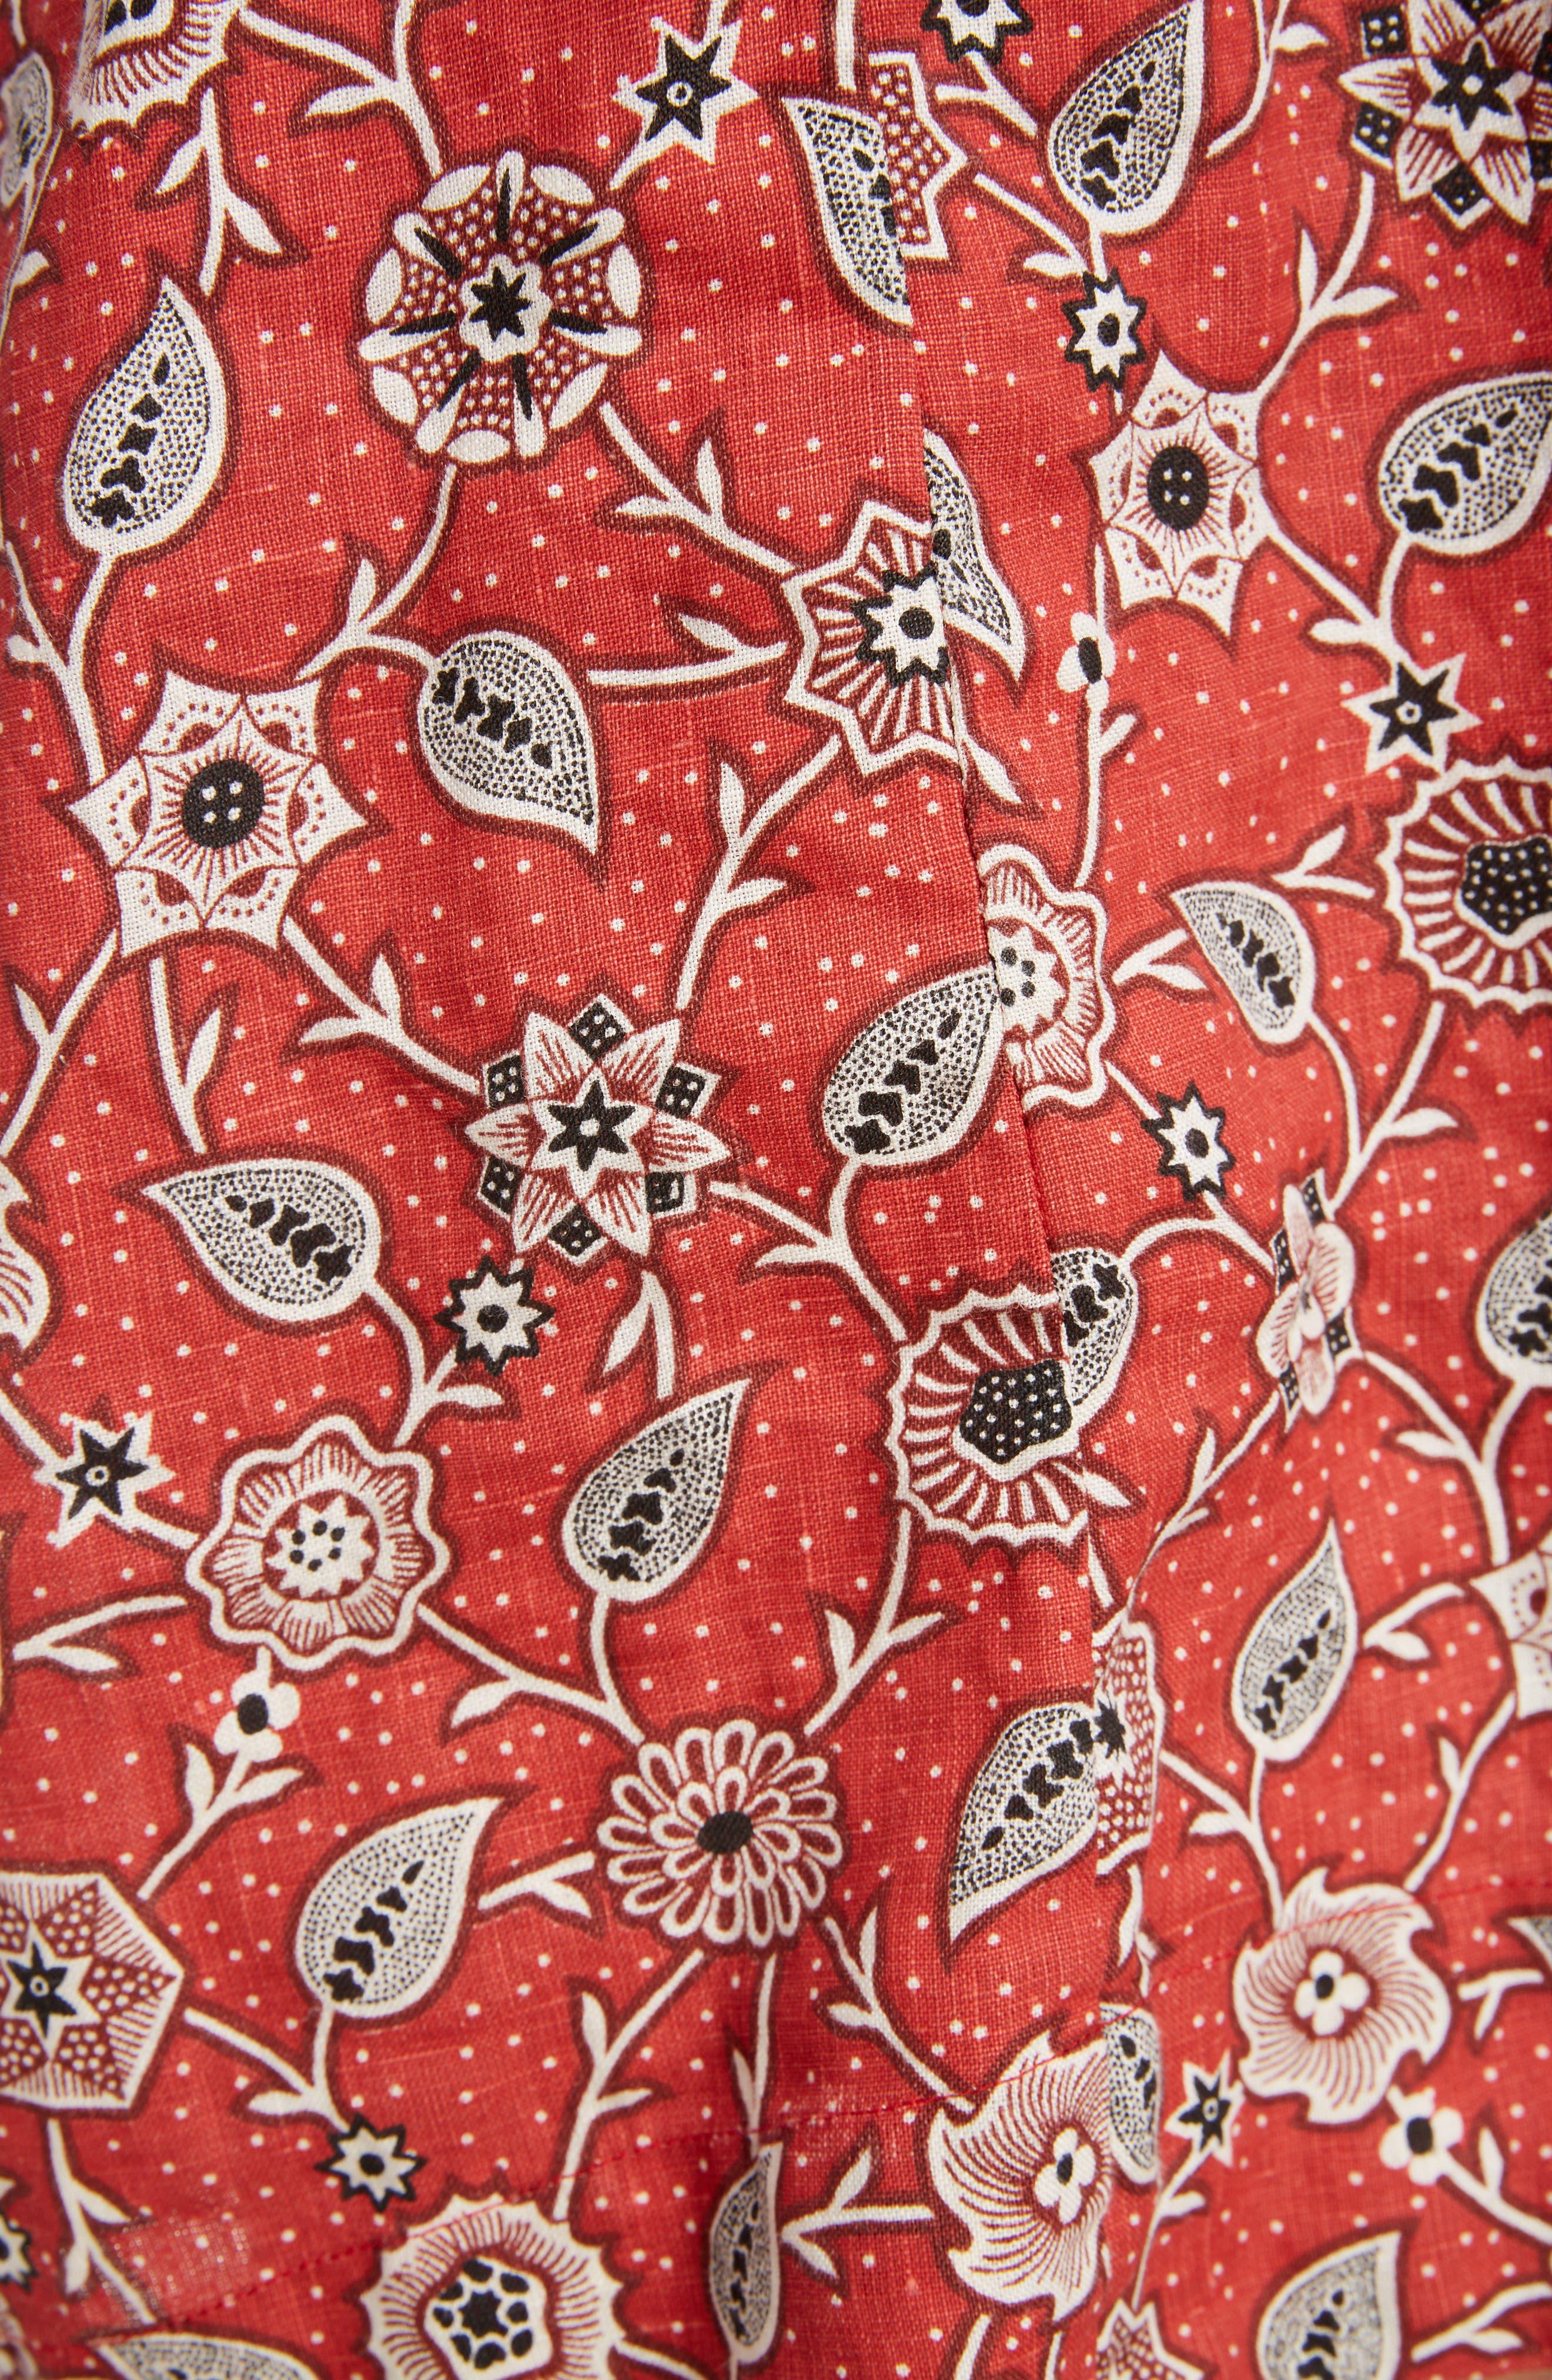 Tockya Print Linen Swing Dress,                             Alternate thumbnail 6, color,                             RUST